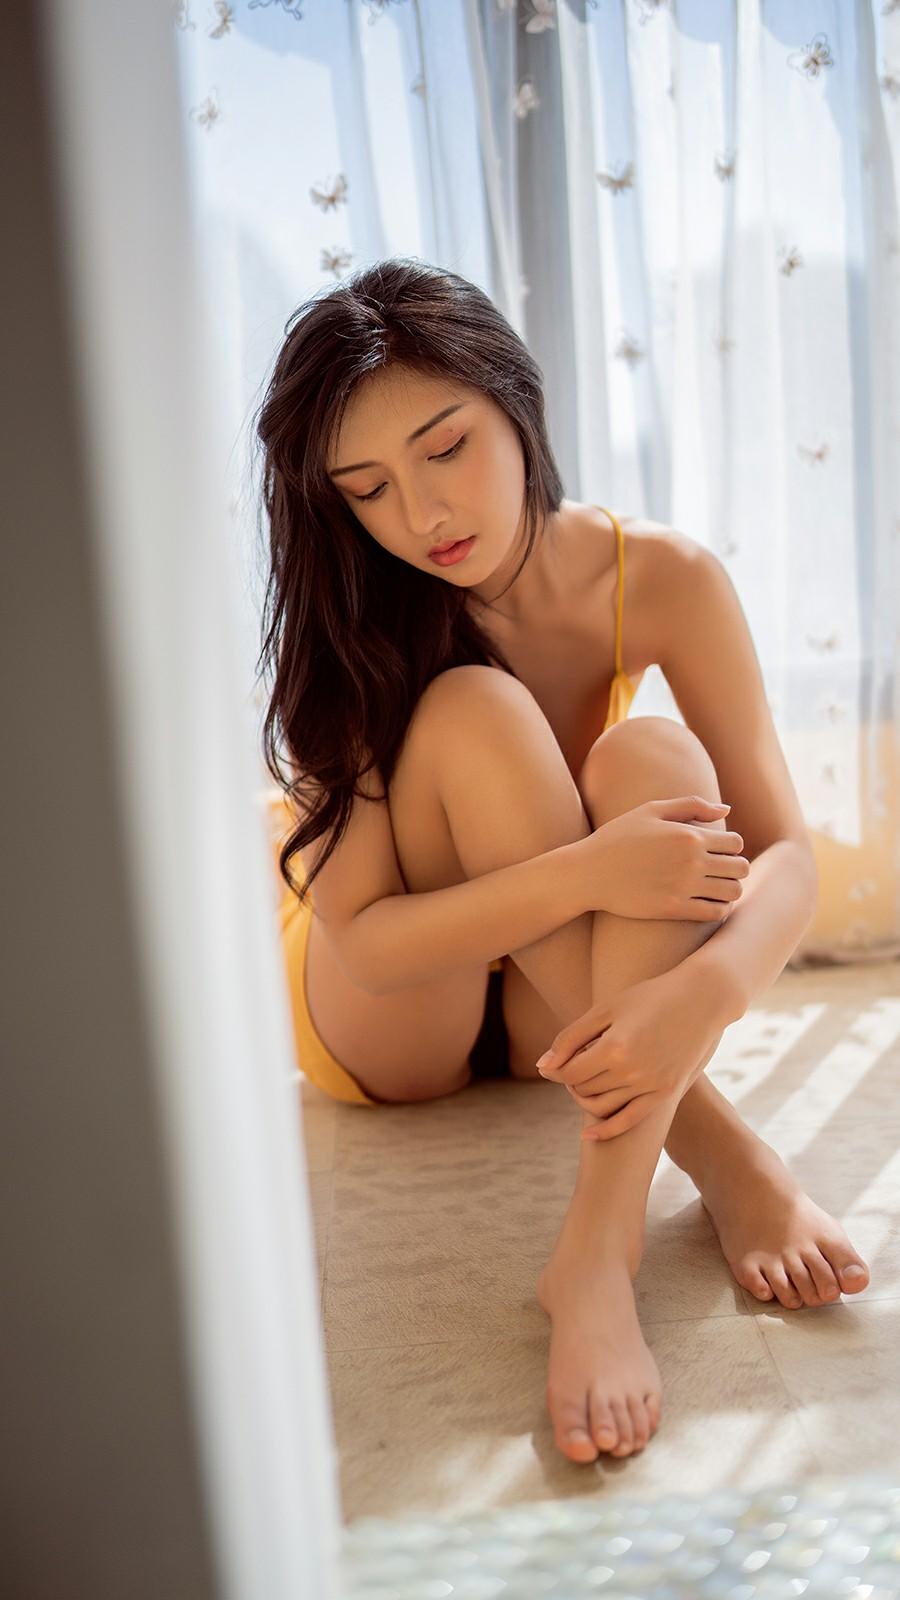 [TouTiao头条女神]2020.04.16 韩熙小狐狸 小鱼的情绪[21P] 头条女神 第4张